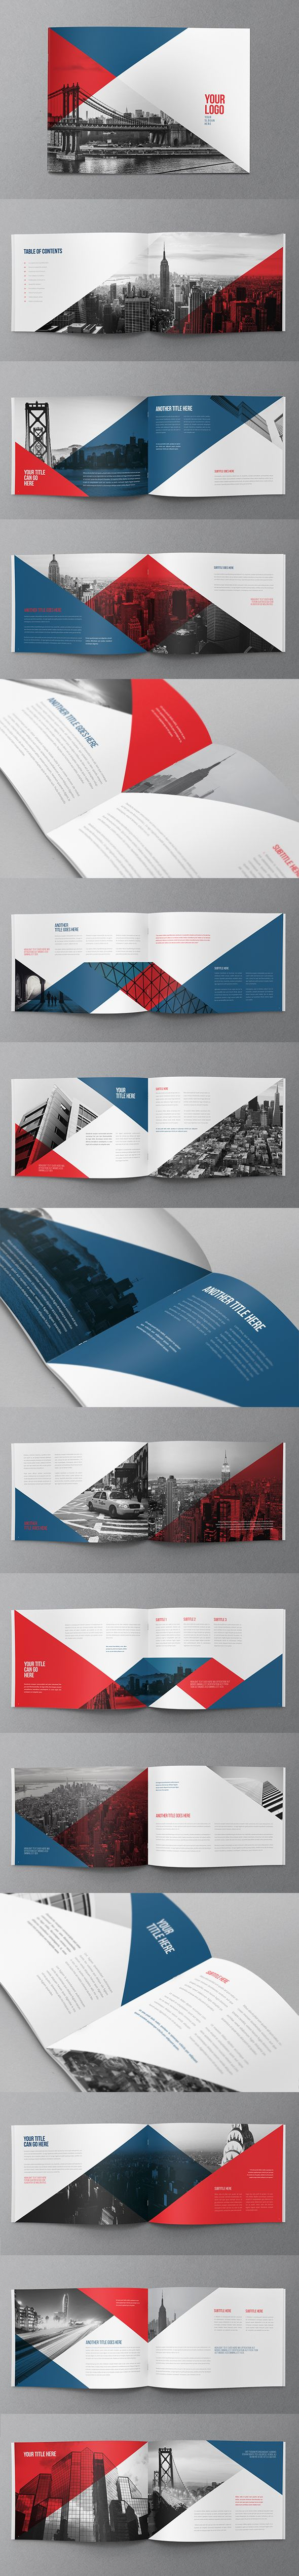 Modern American Brochure. Download here: http://graphicriver.net/item/modern-american-brochure/11454850?ref=abradesign #brochure #design